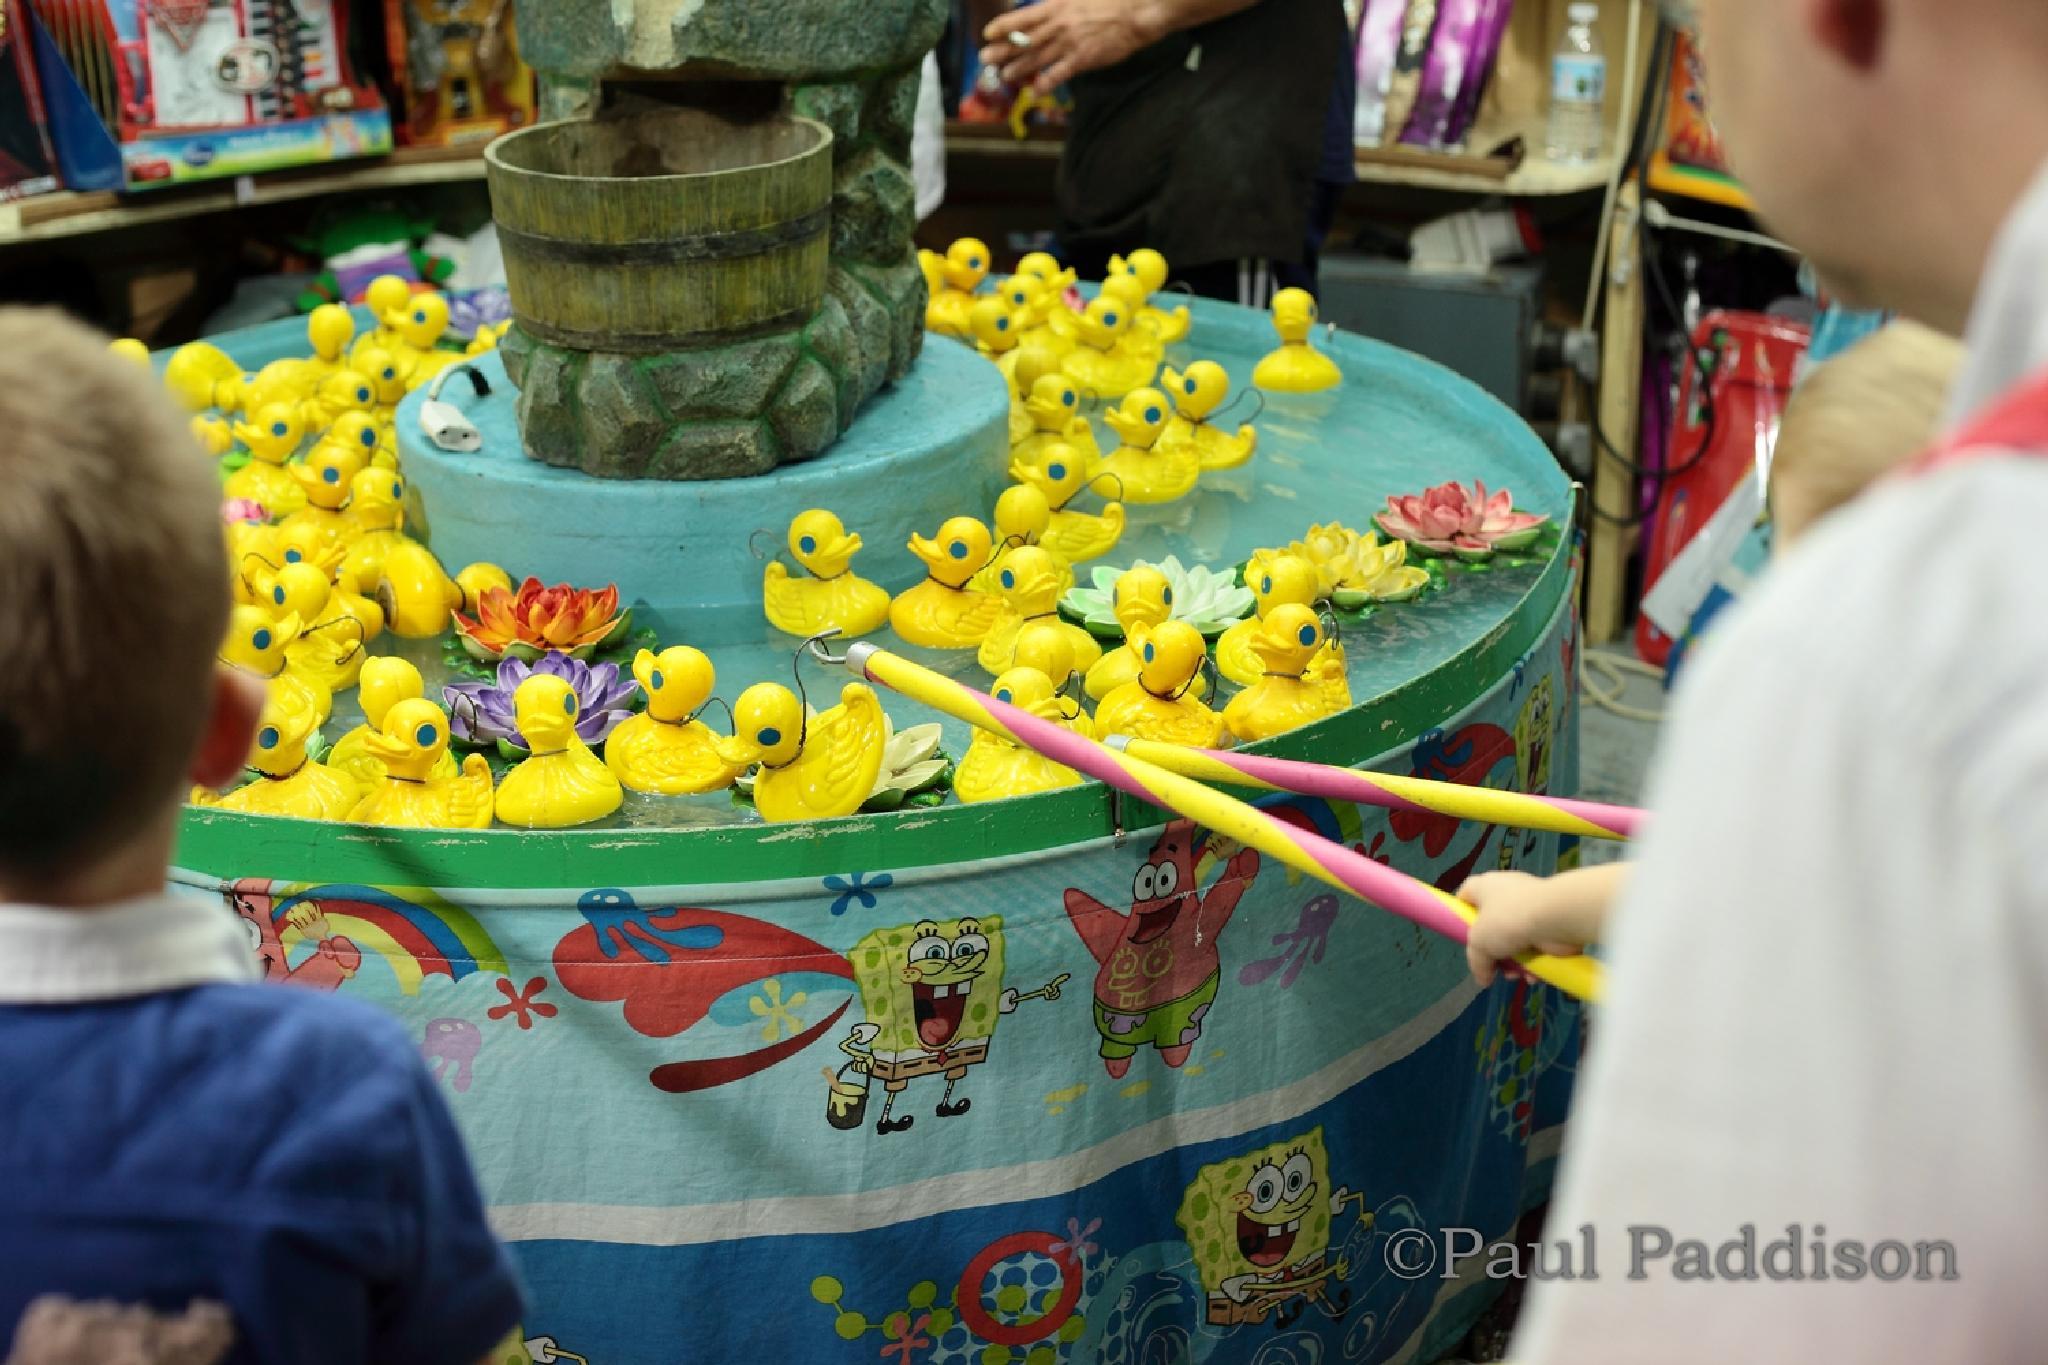 Ducks by Paul Paddison